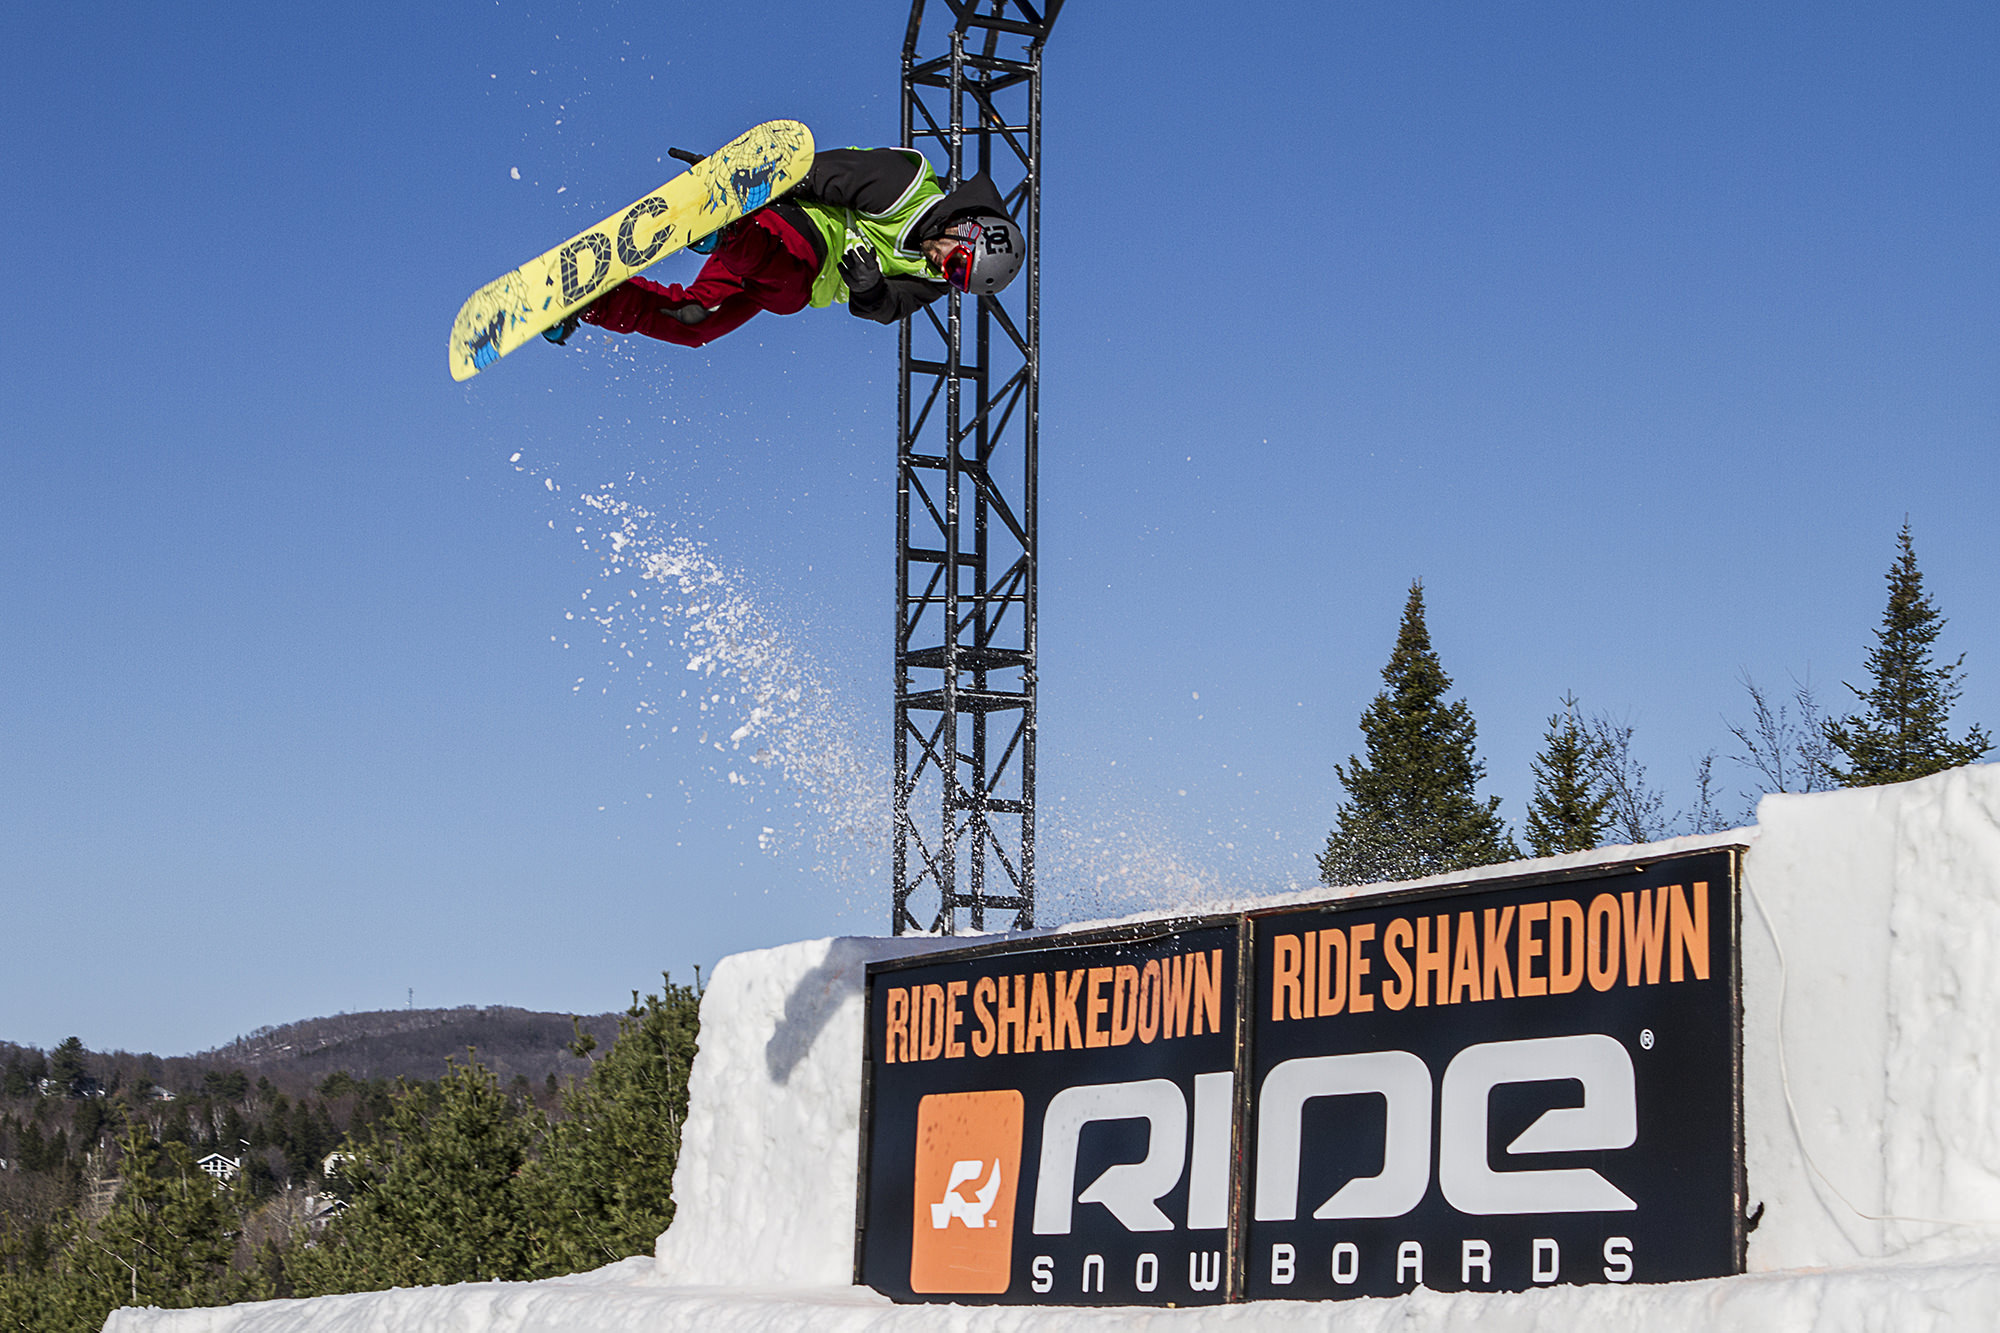 Ride Shakedown 2013 - Saint-Sauveur, Qc